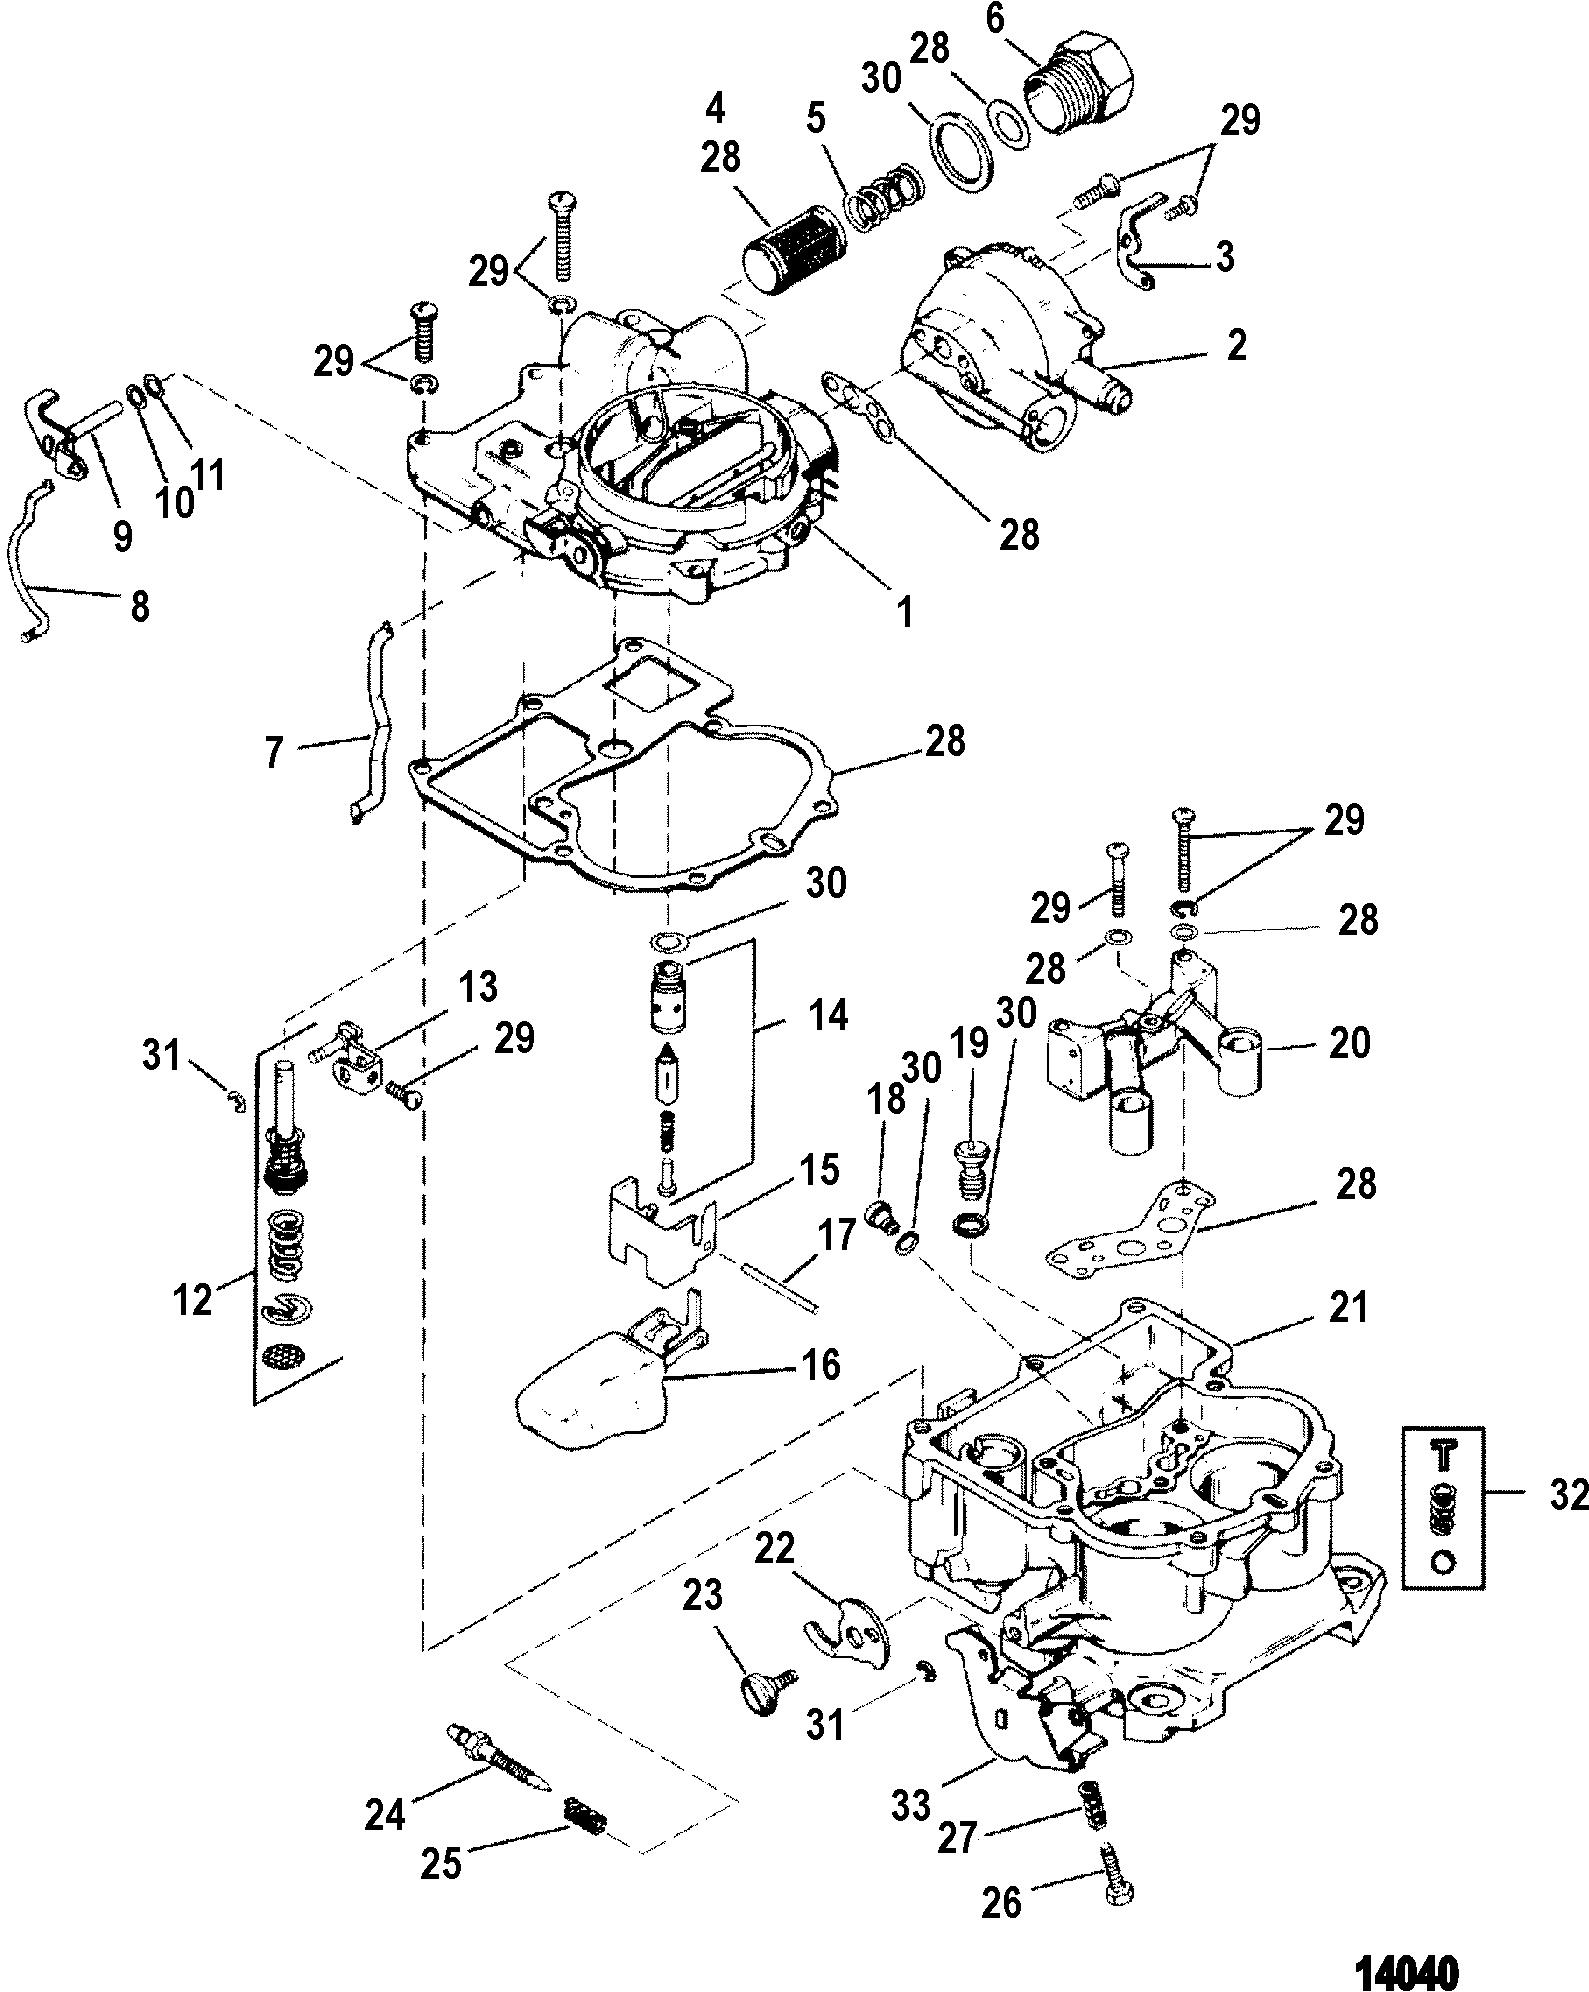 Makita hm1500 parts list and diagram ereplacementparts like it pinterest demolition hammer